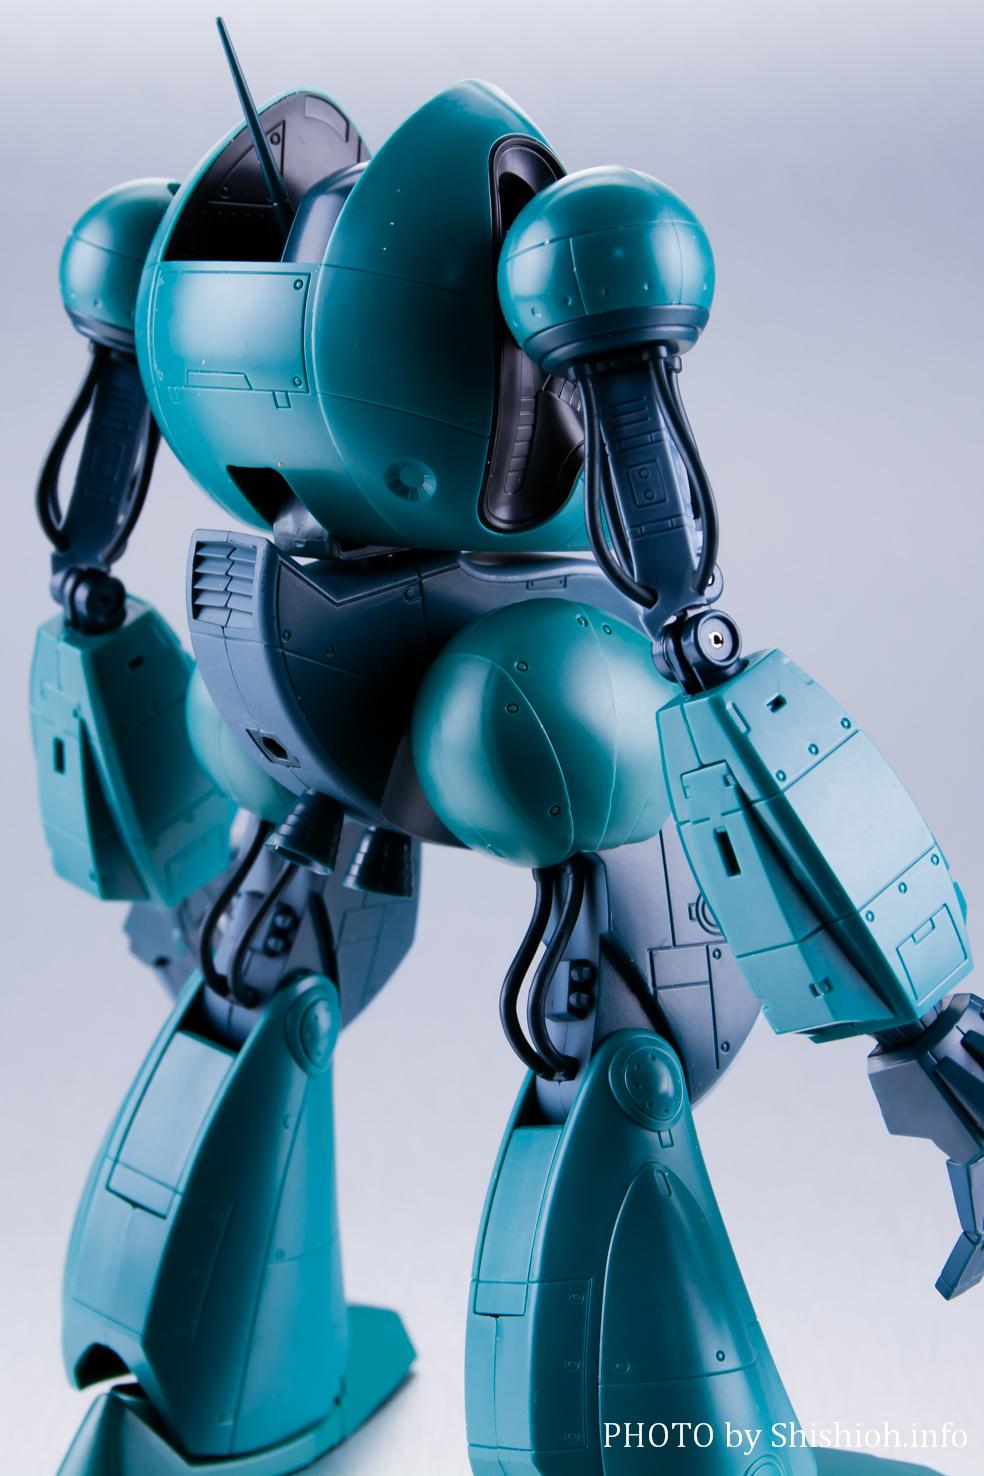 HI-METAL R ガバメントタイプ (ティンプ機)